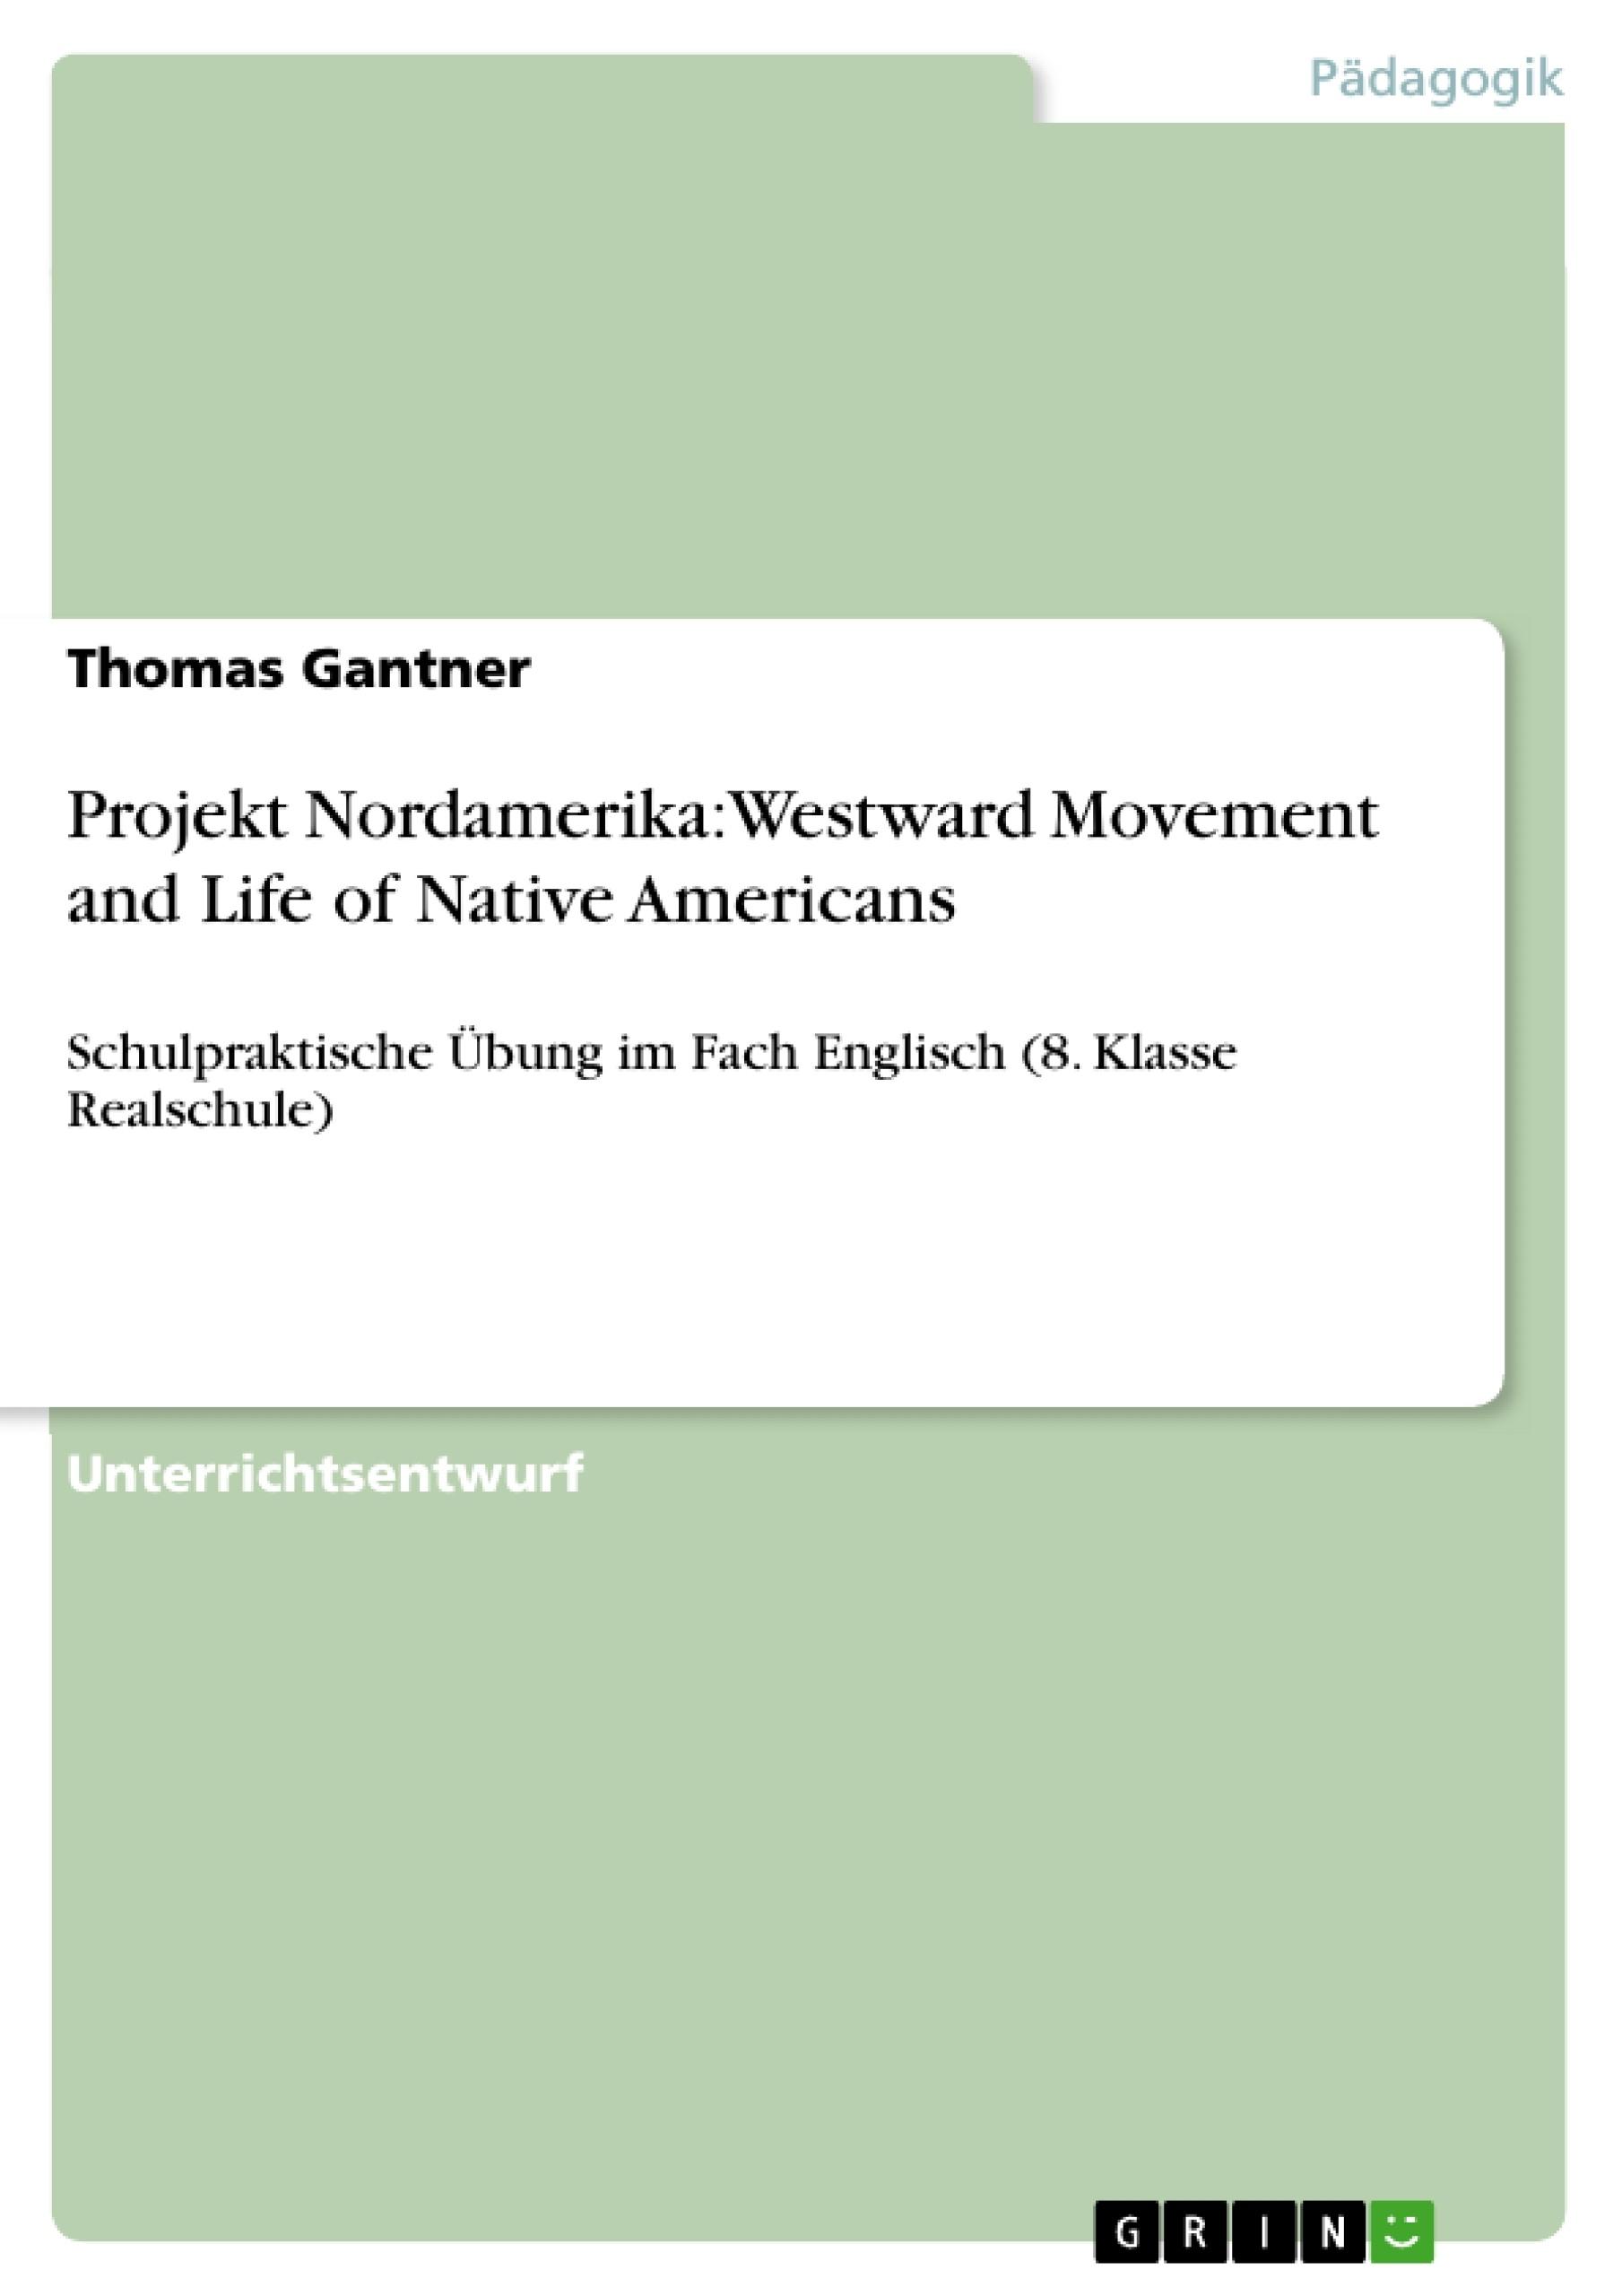 Titel: Projekt Nordamerika: Westward Movement and Life of Native Americans